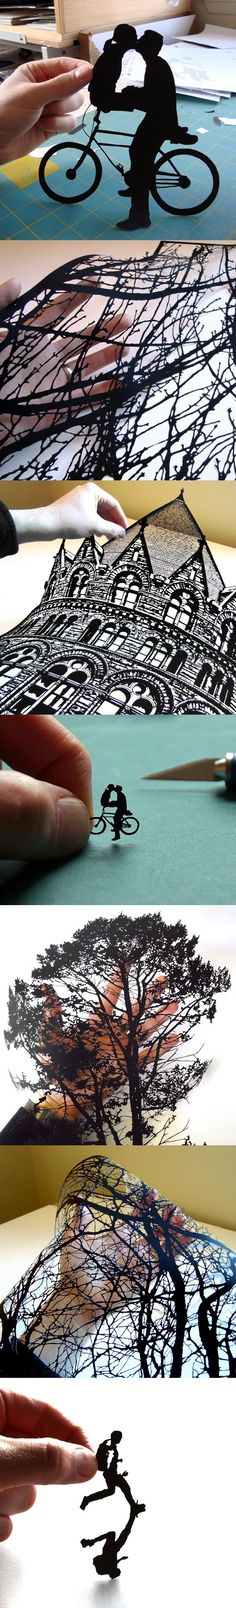 hand-cut paper art by Joe Bagley